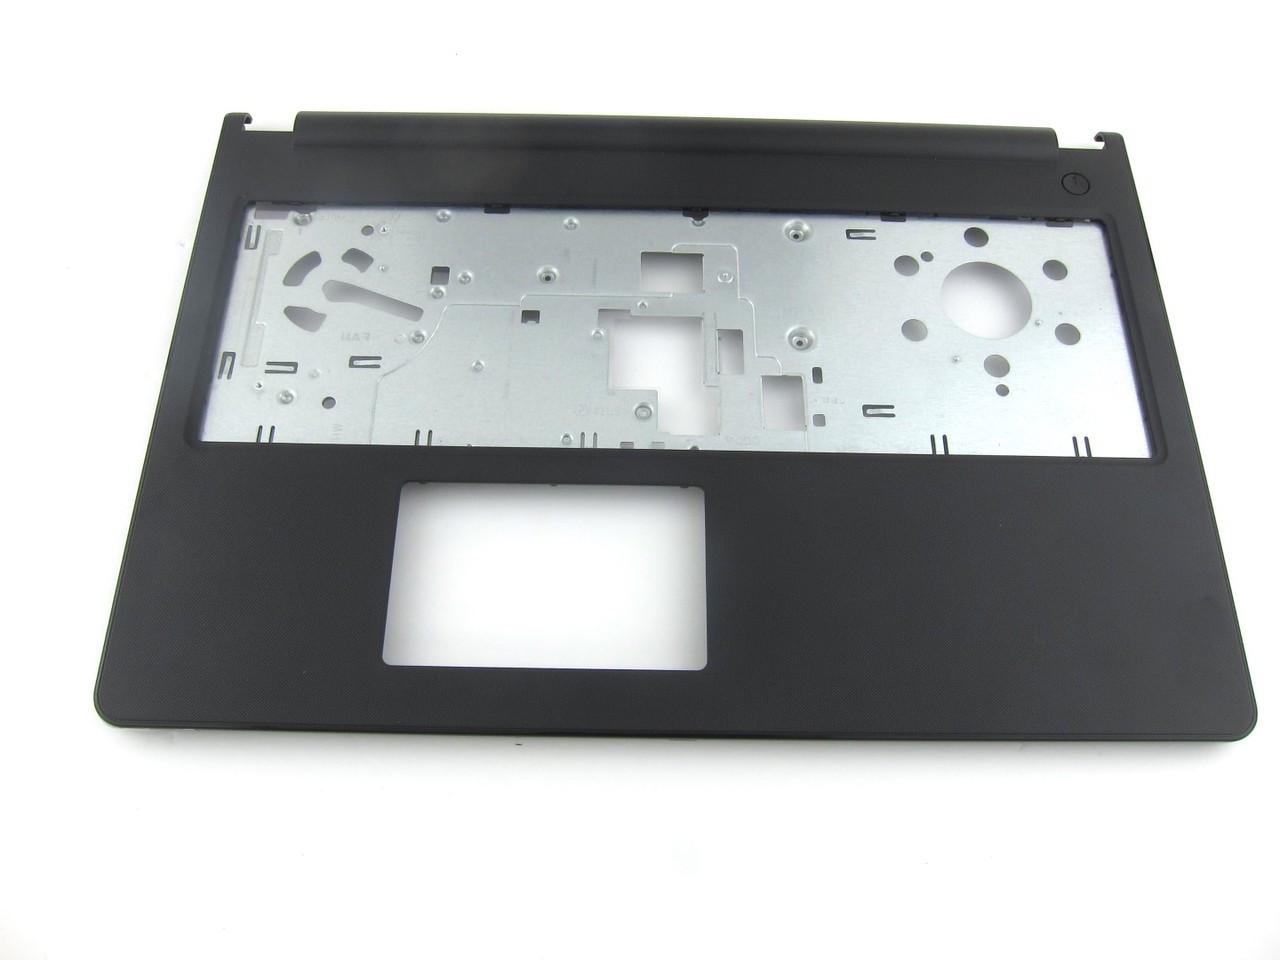 Dell Inspiron 3565 / 3567 Palmrest Assembly - 4F55W